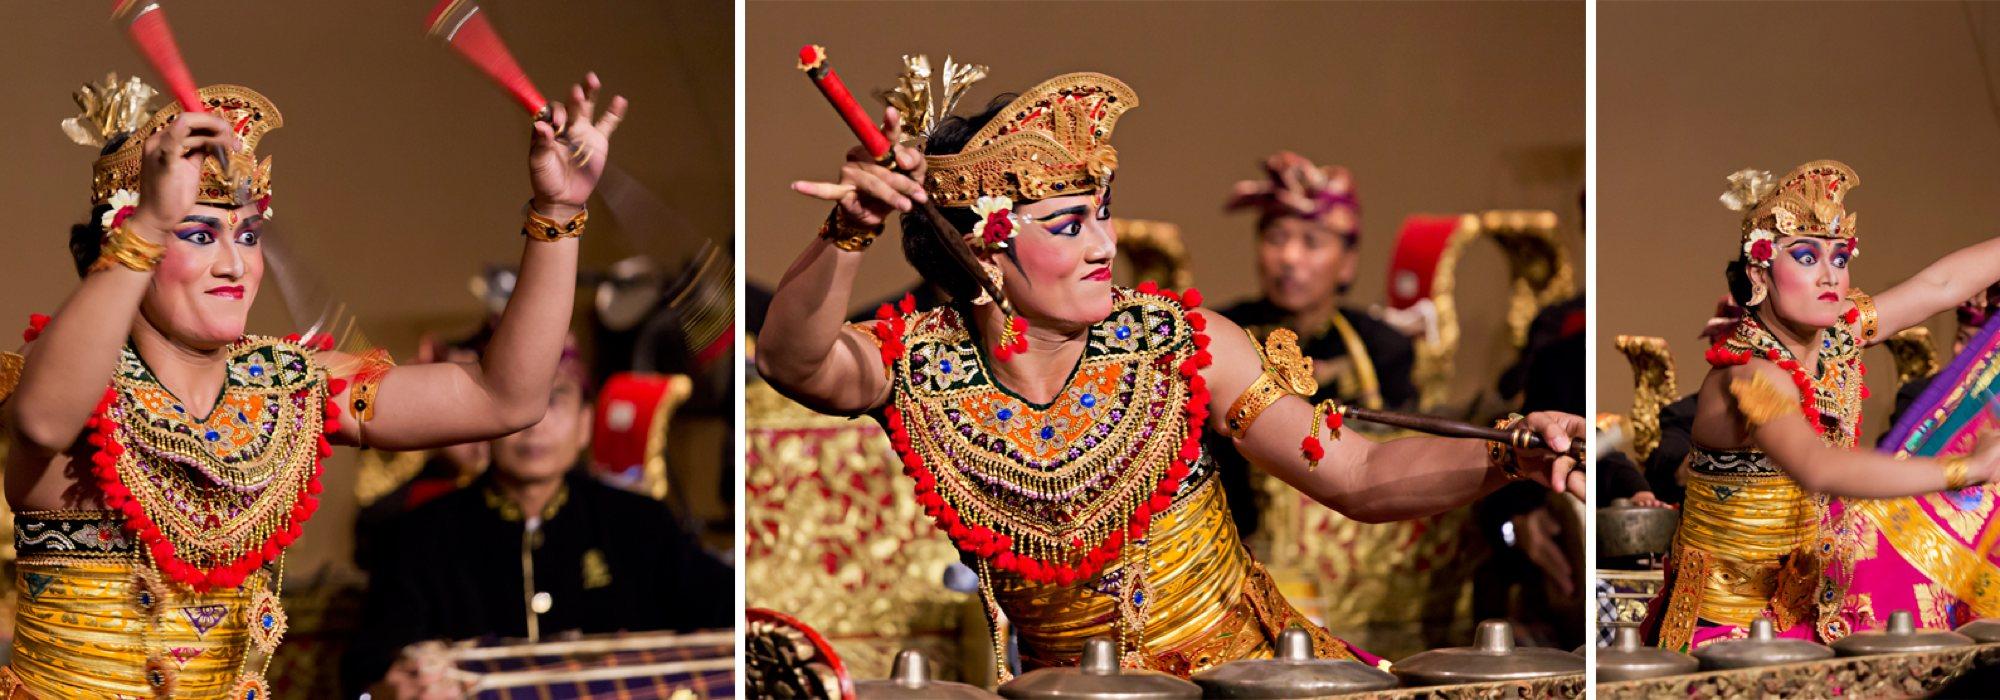 Performer in bright costume twirling gamelan mallets